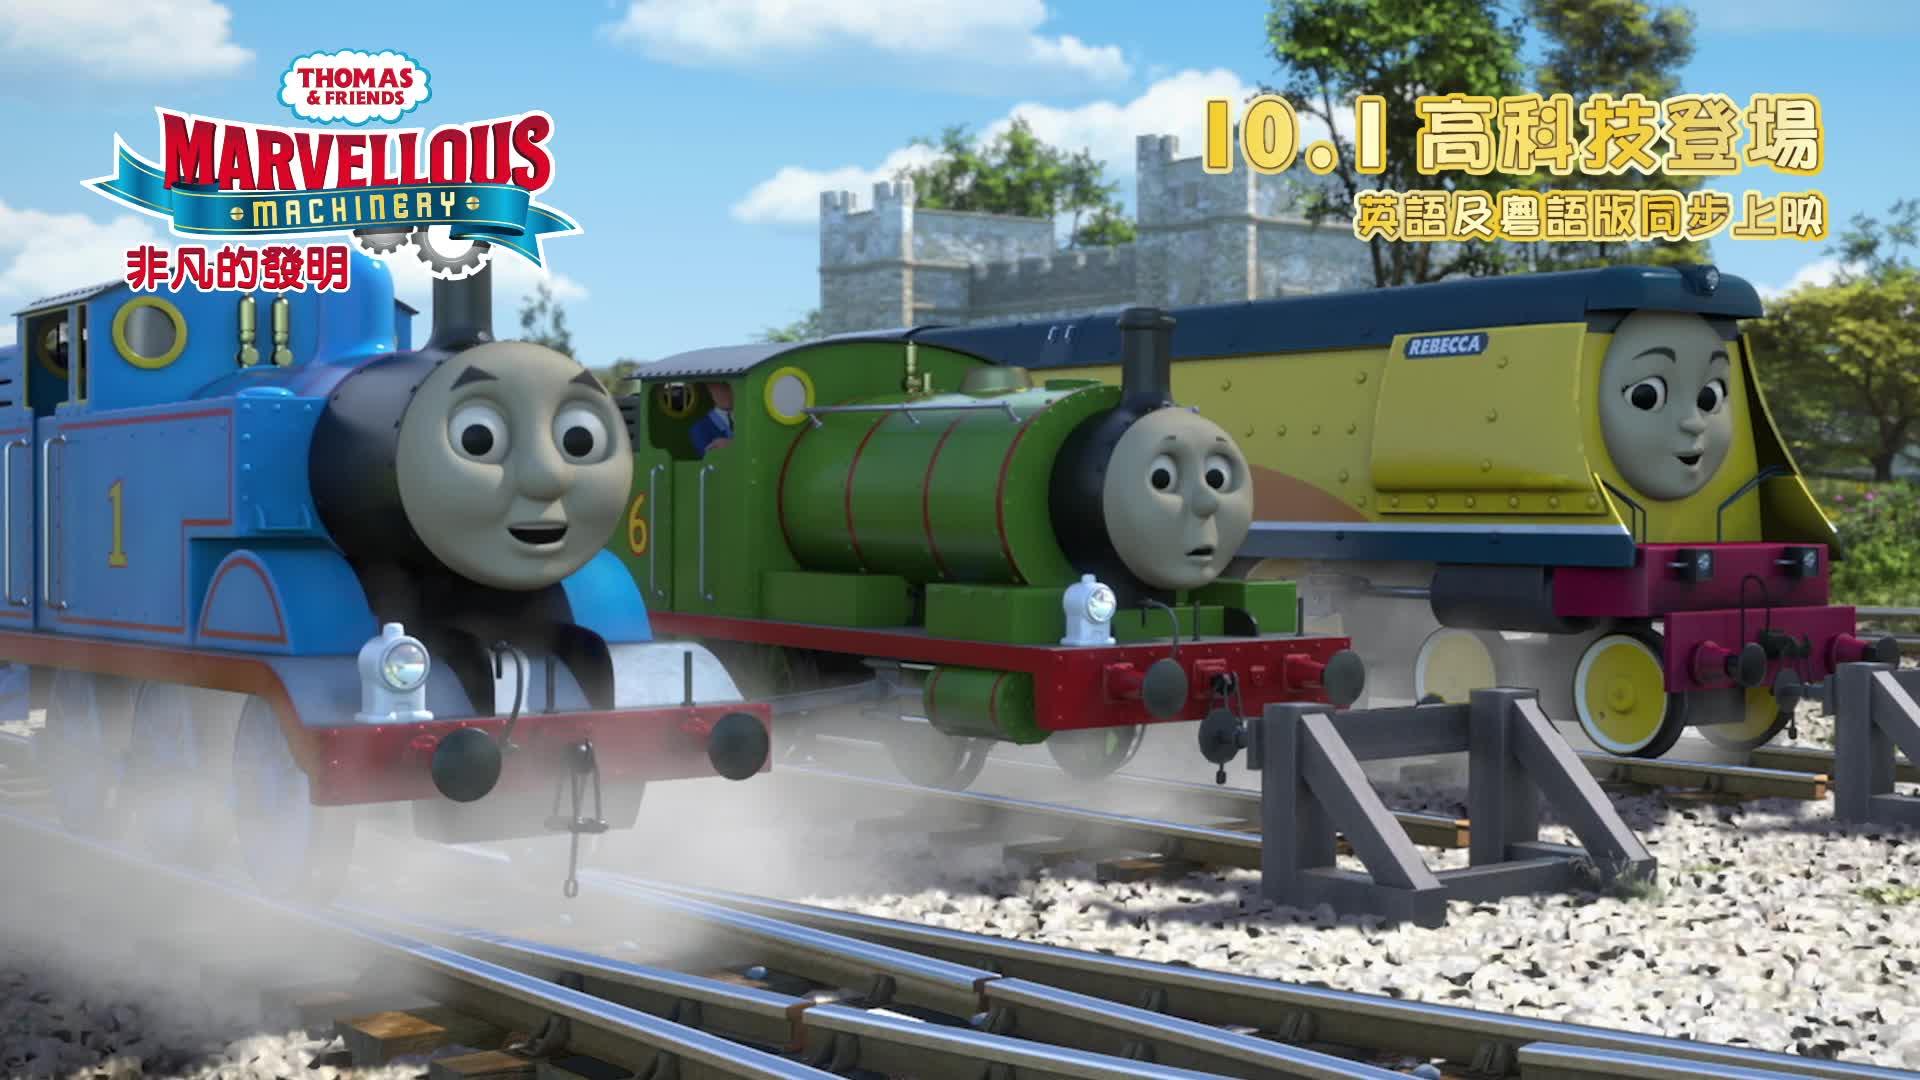 《Thomas & Friends 非凡的發明》電影預告